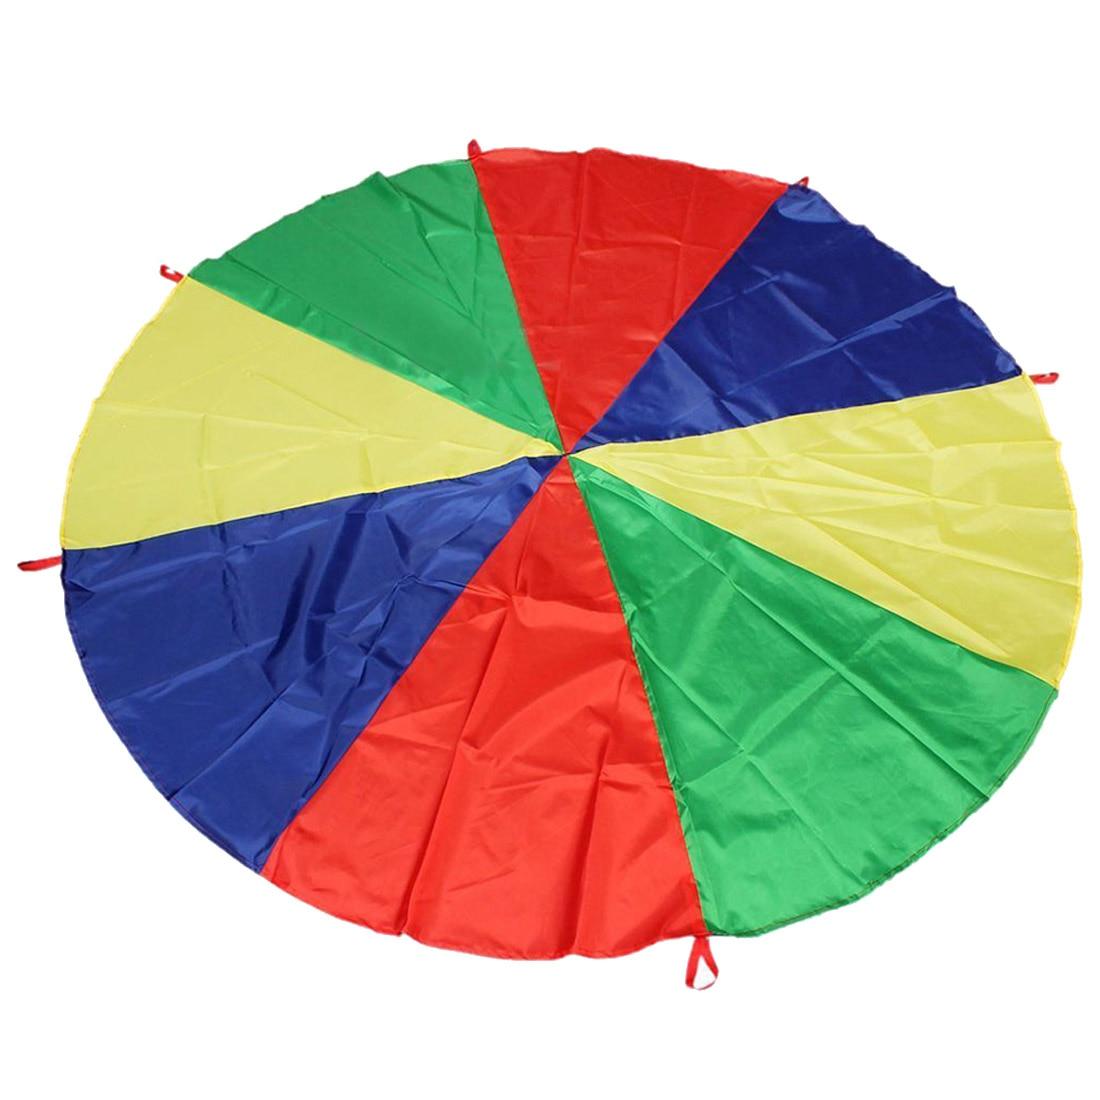 ¡Superventas! Paracaídas de arcoíris para niños de 2M/6,5 pies de ABWE